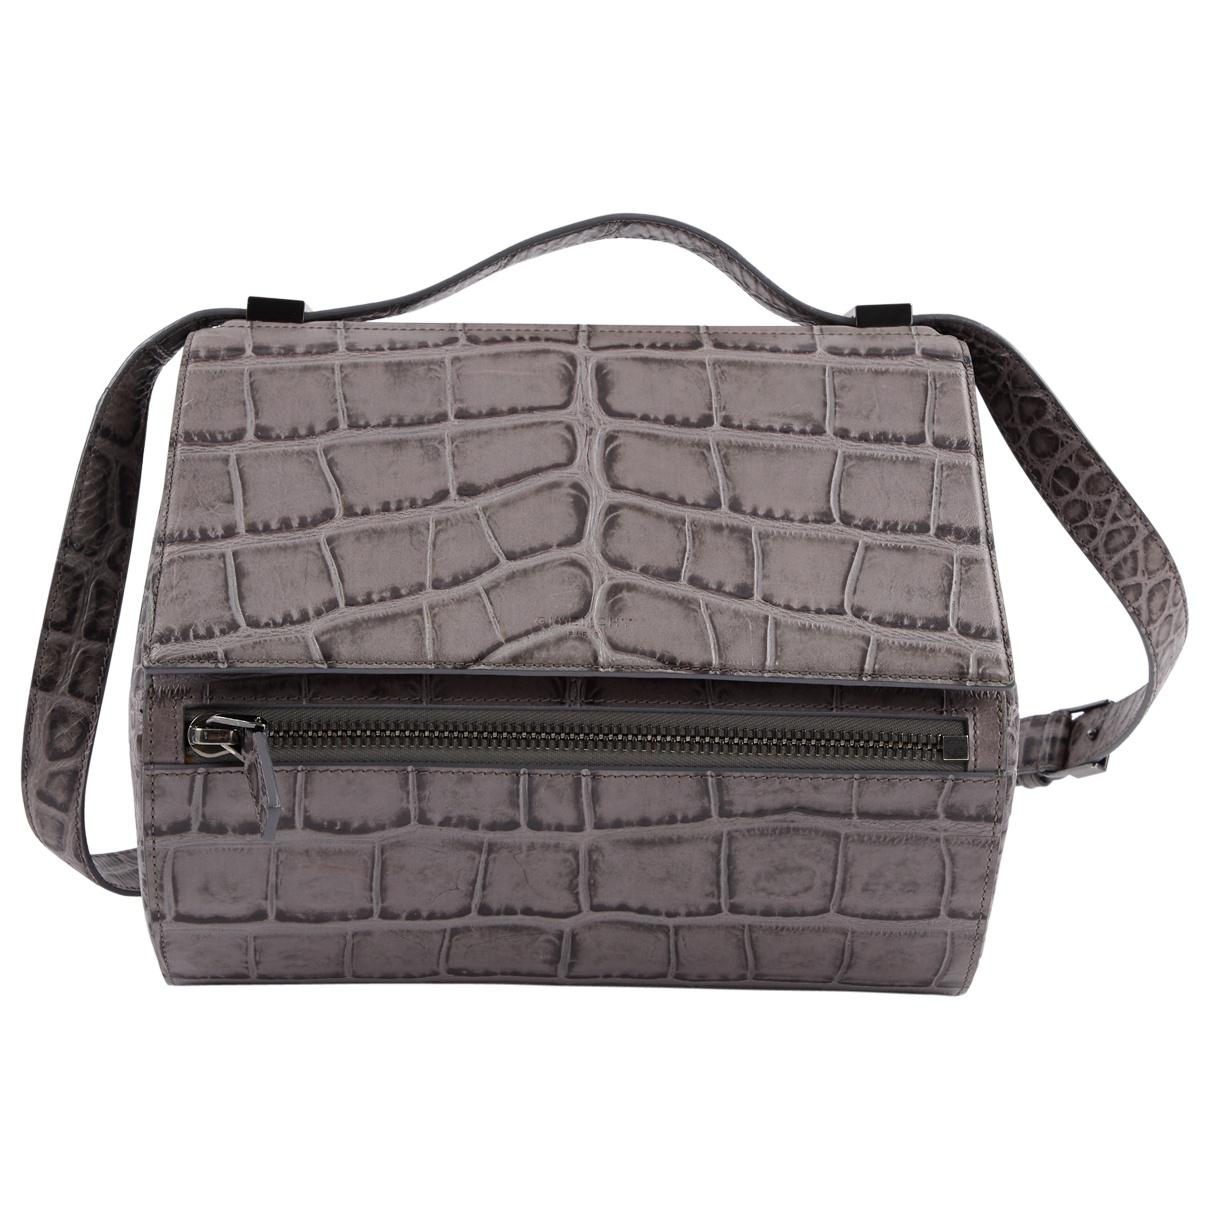 55f381b72e4f Givenchy Pandora Box Grey Leather Handbag in Gray - Lyst